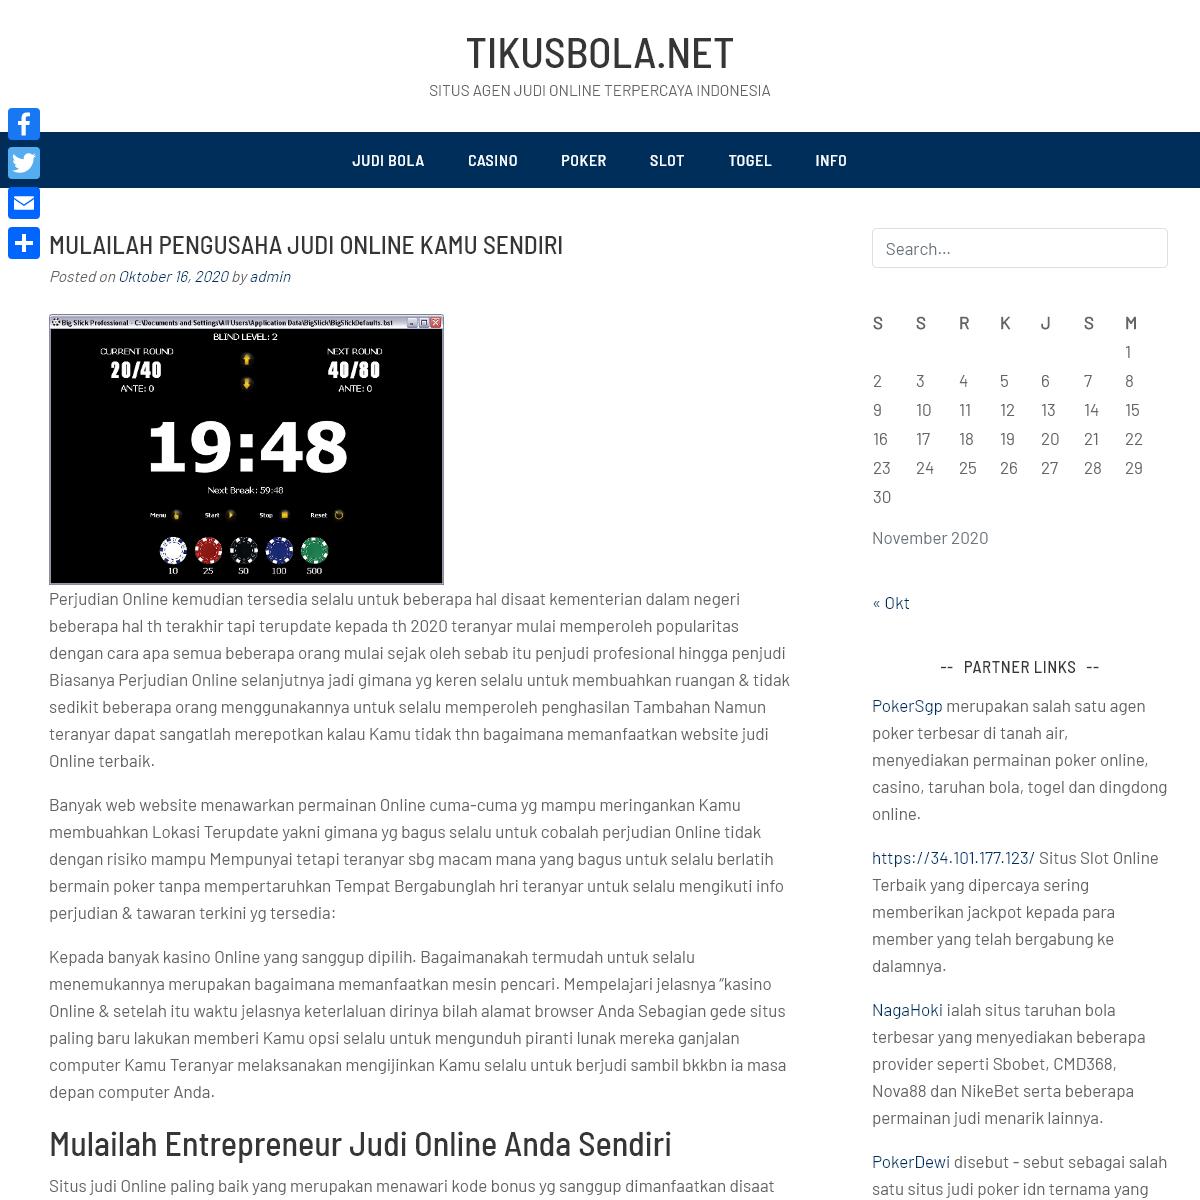 tikusbola.net - Situs Agen Judi Online Terpercaya Indonesia